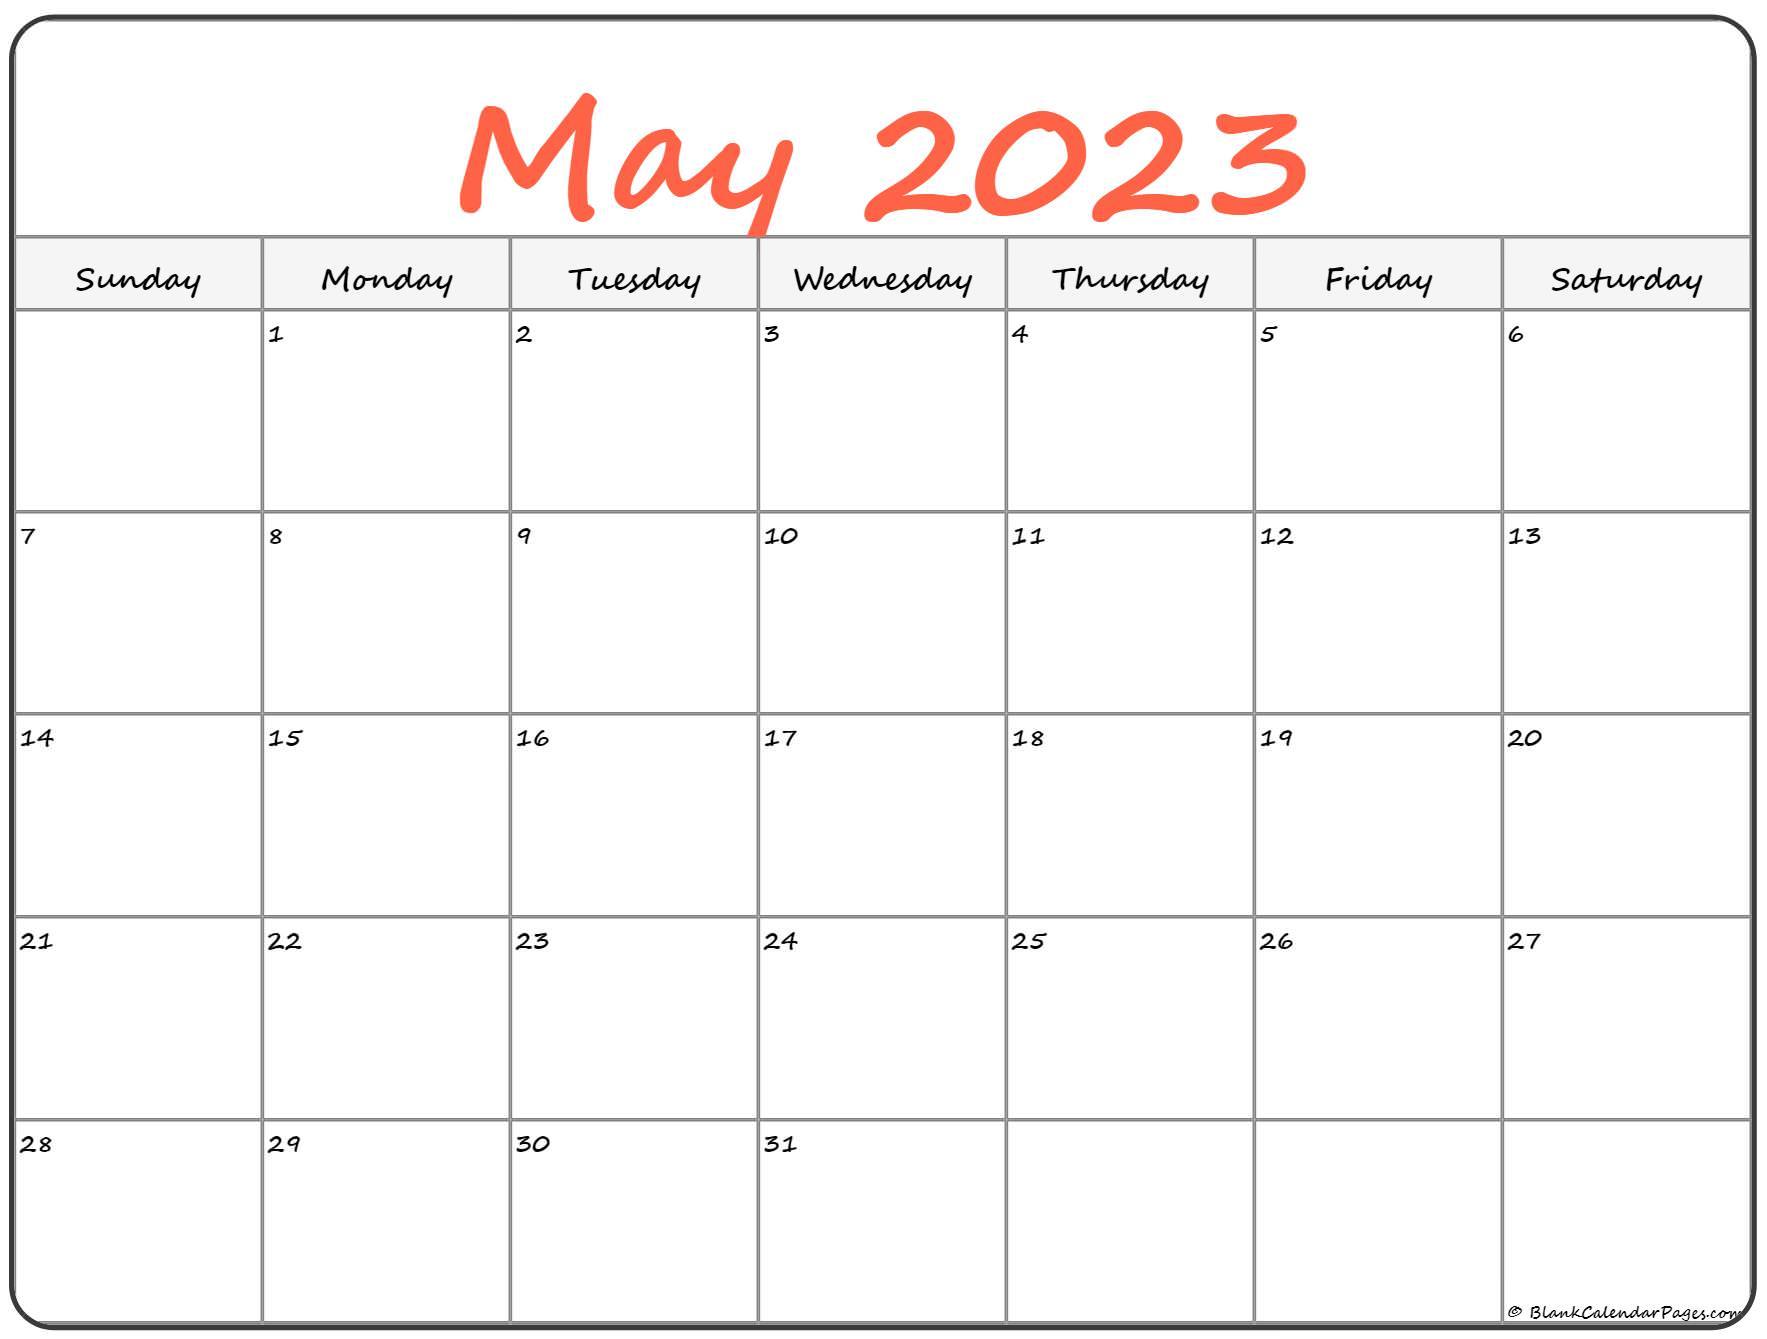 May 2022 calendar   free printable monthly calendars